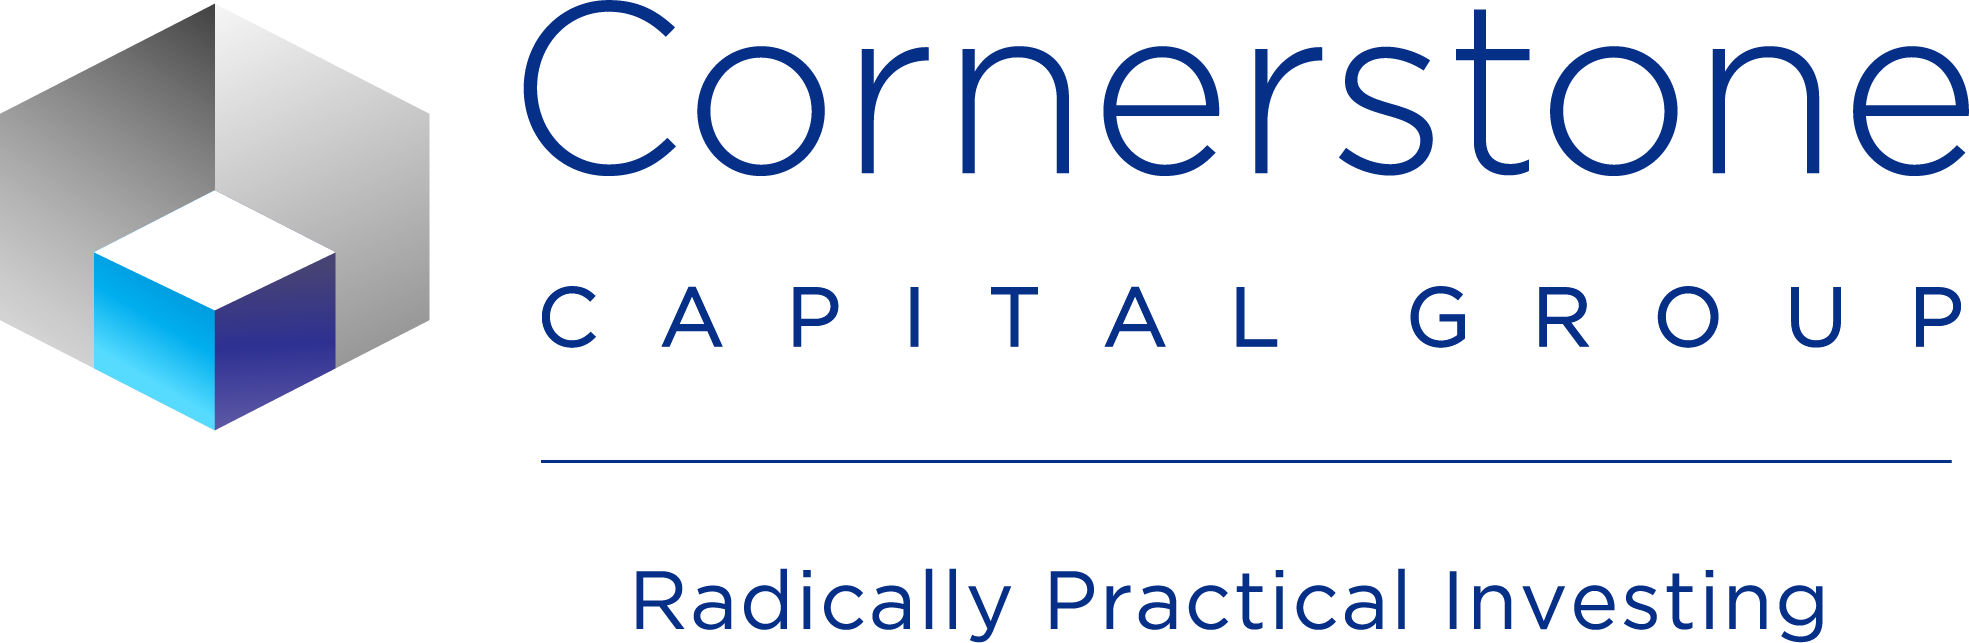 cornerstonecapitalgroup